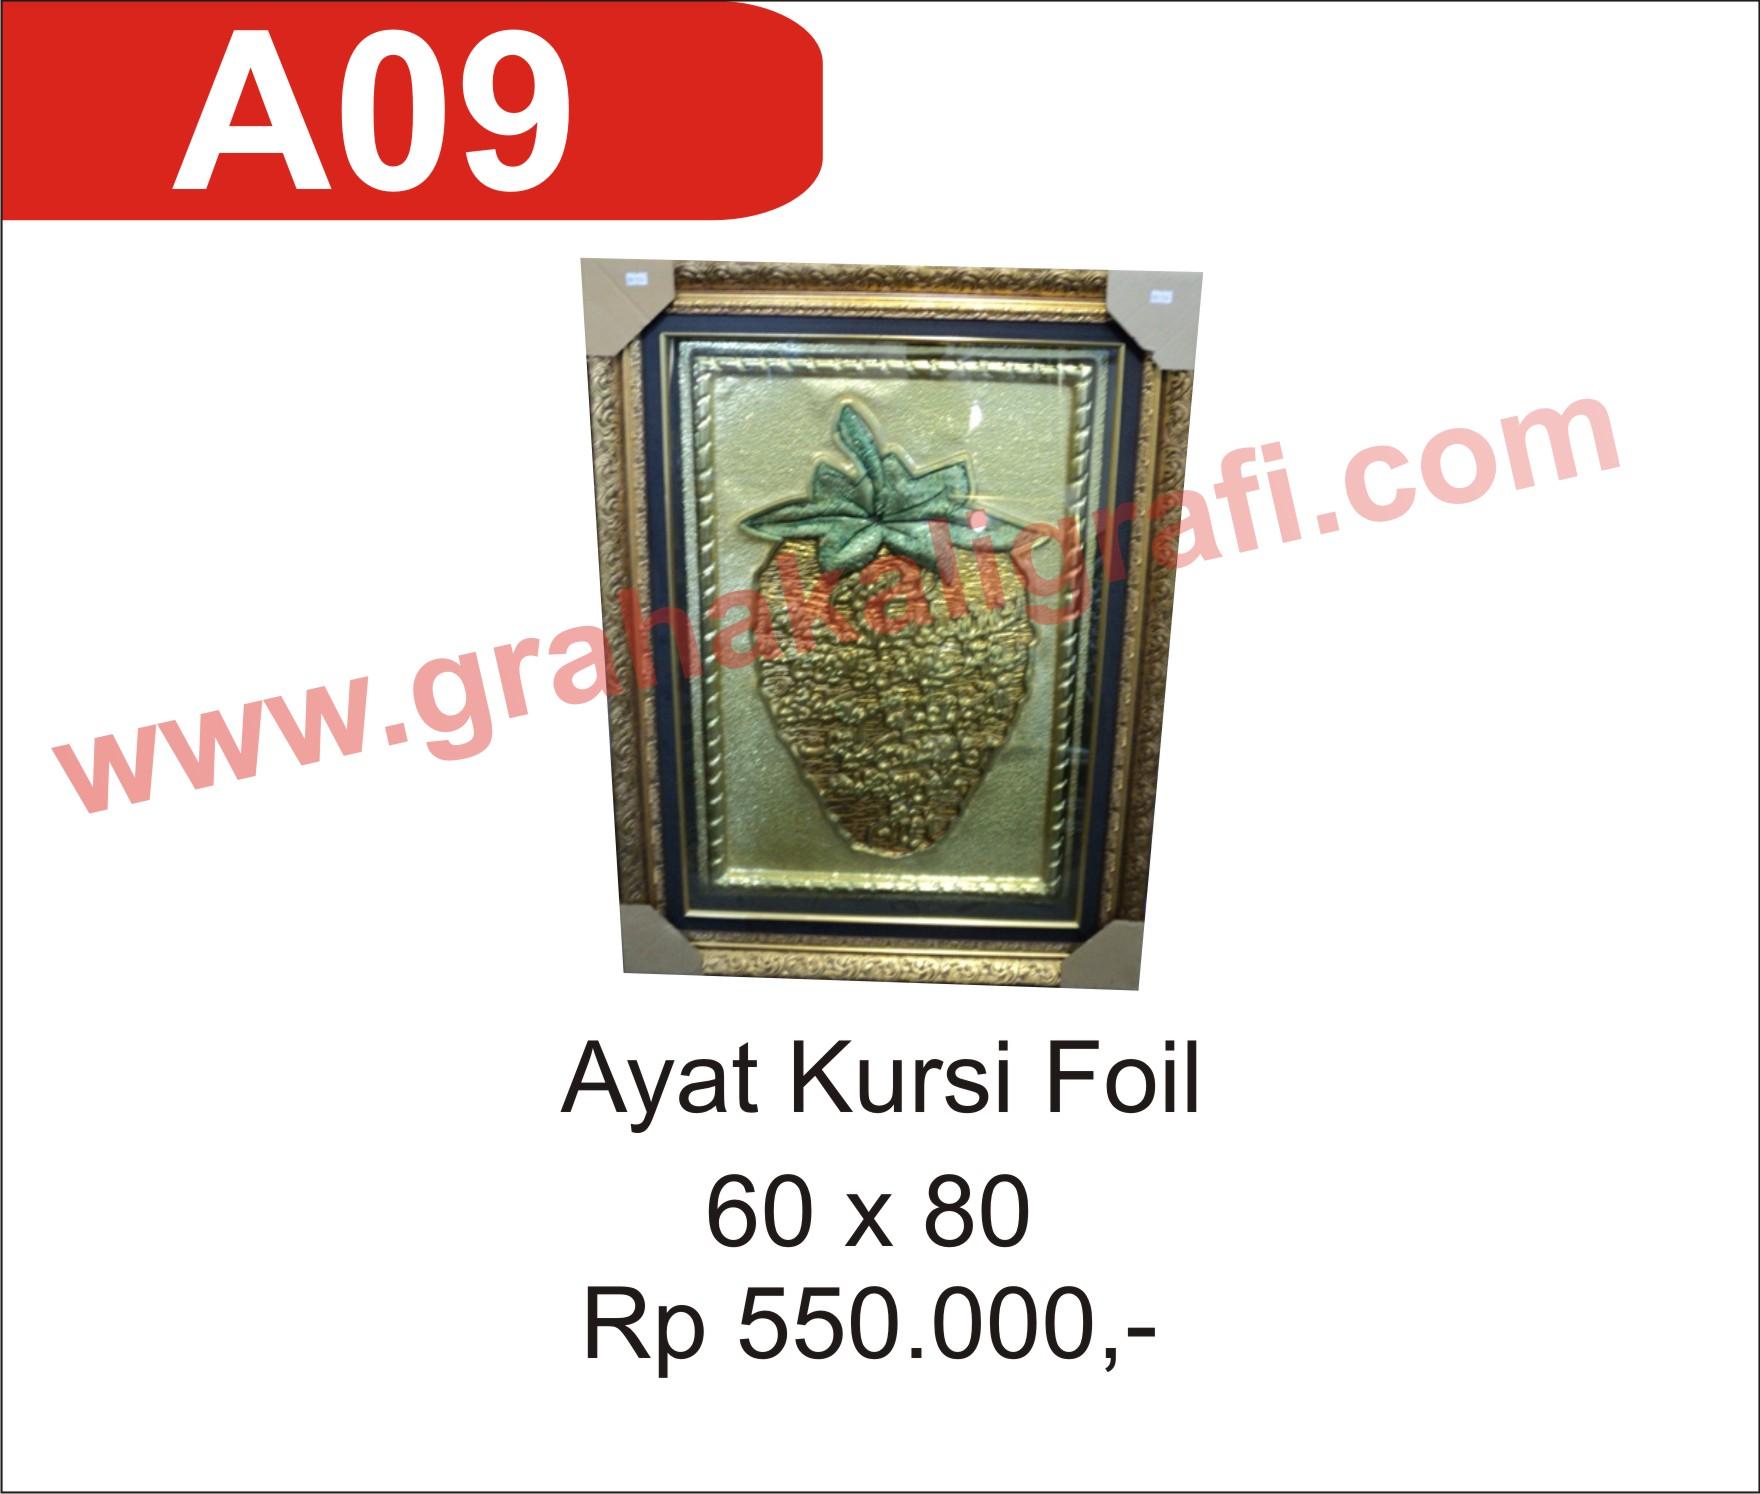 a09-ayat-kursi-foil-graha-kaligrafi-kaligrafi-islam-kaligrafi-arab.jpg